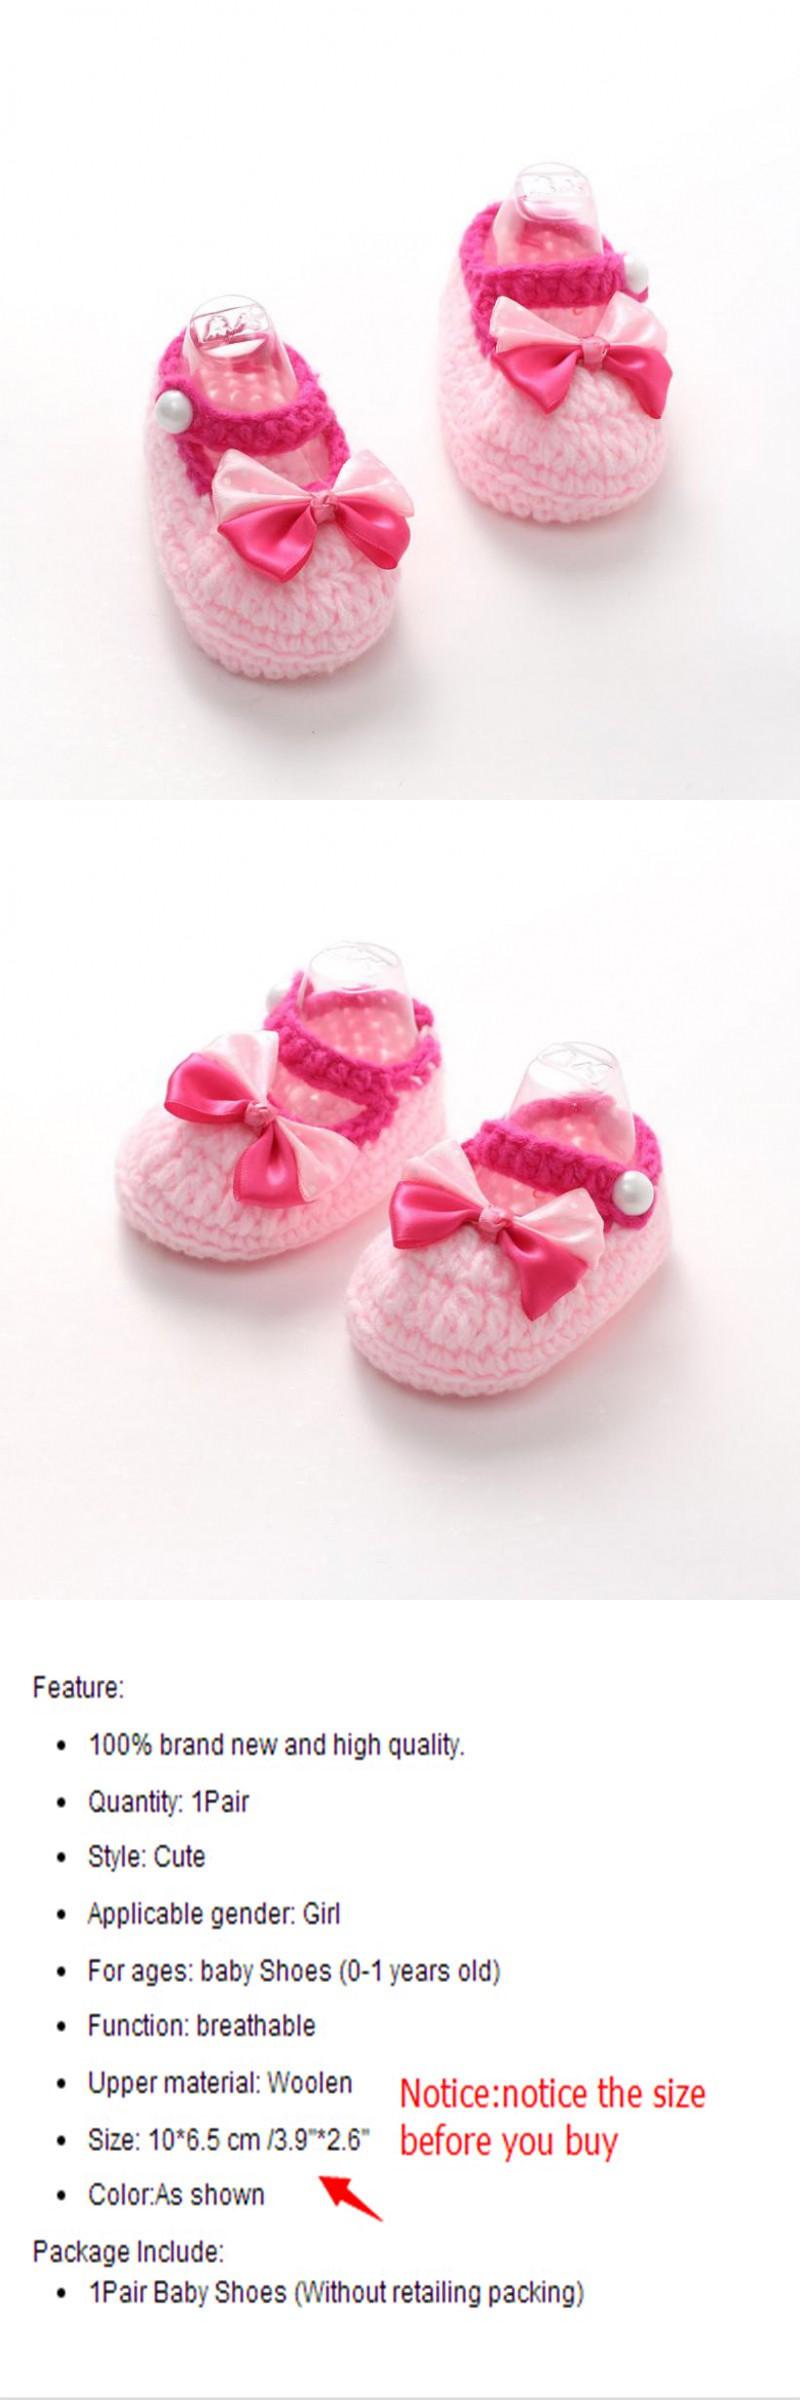 Colorful Häkeln Pantoffeln Kostenlos Muster Mary Jane Motif - Decke ...